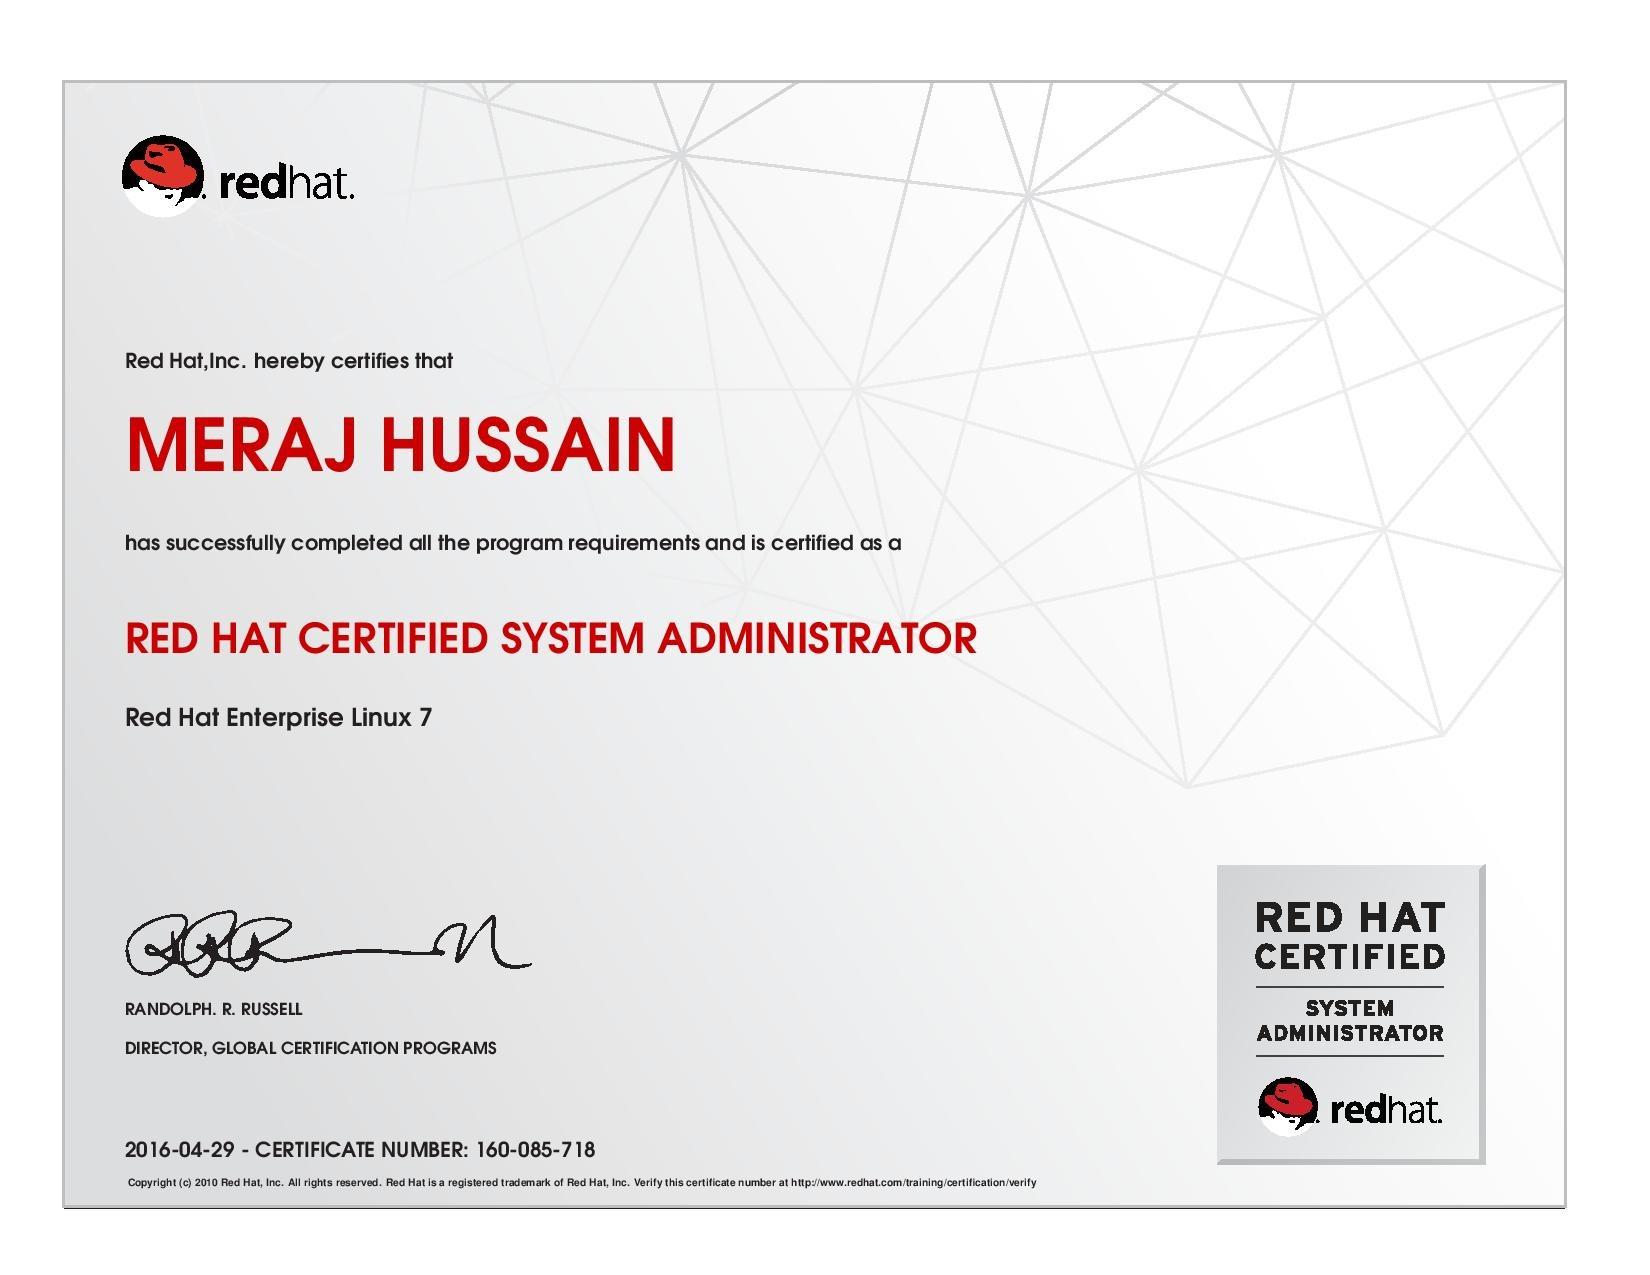 Meraj hussain bayt red hat certified system administrator certificate xflitez Gallery